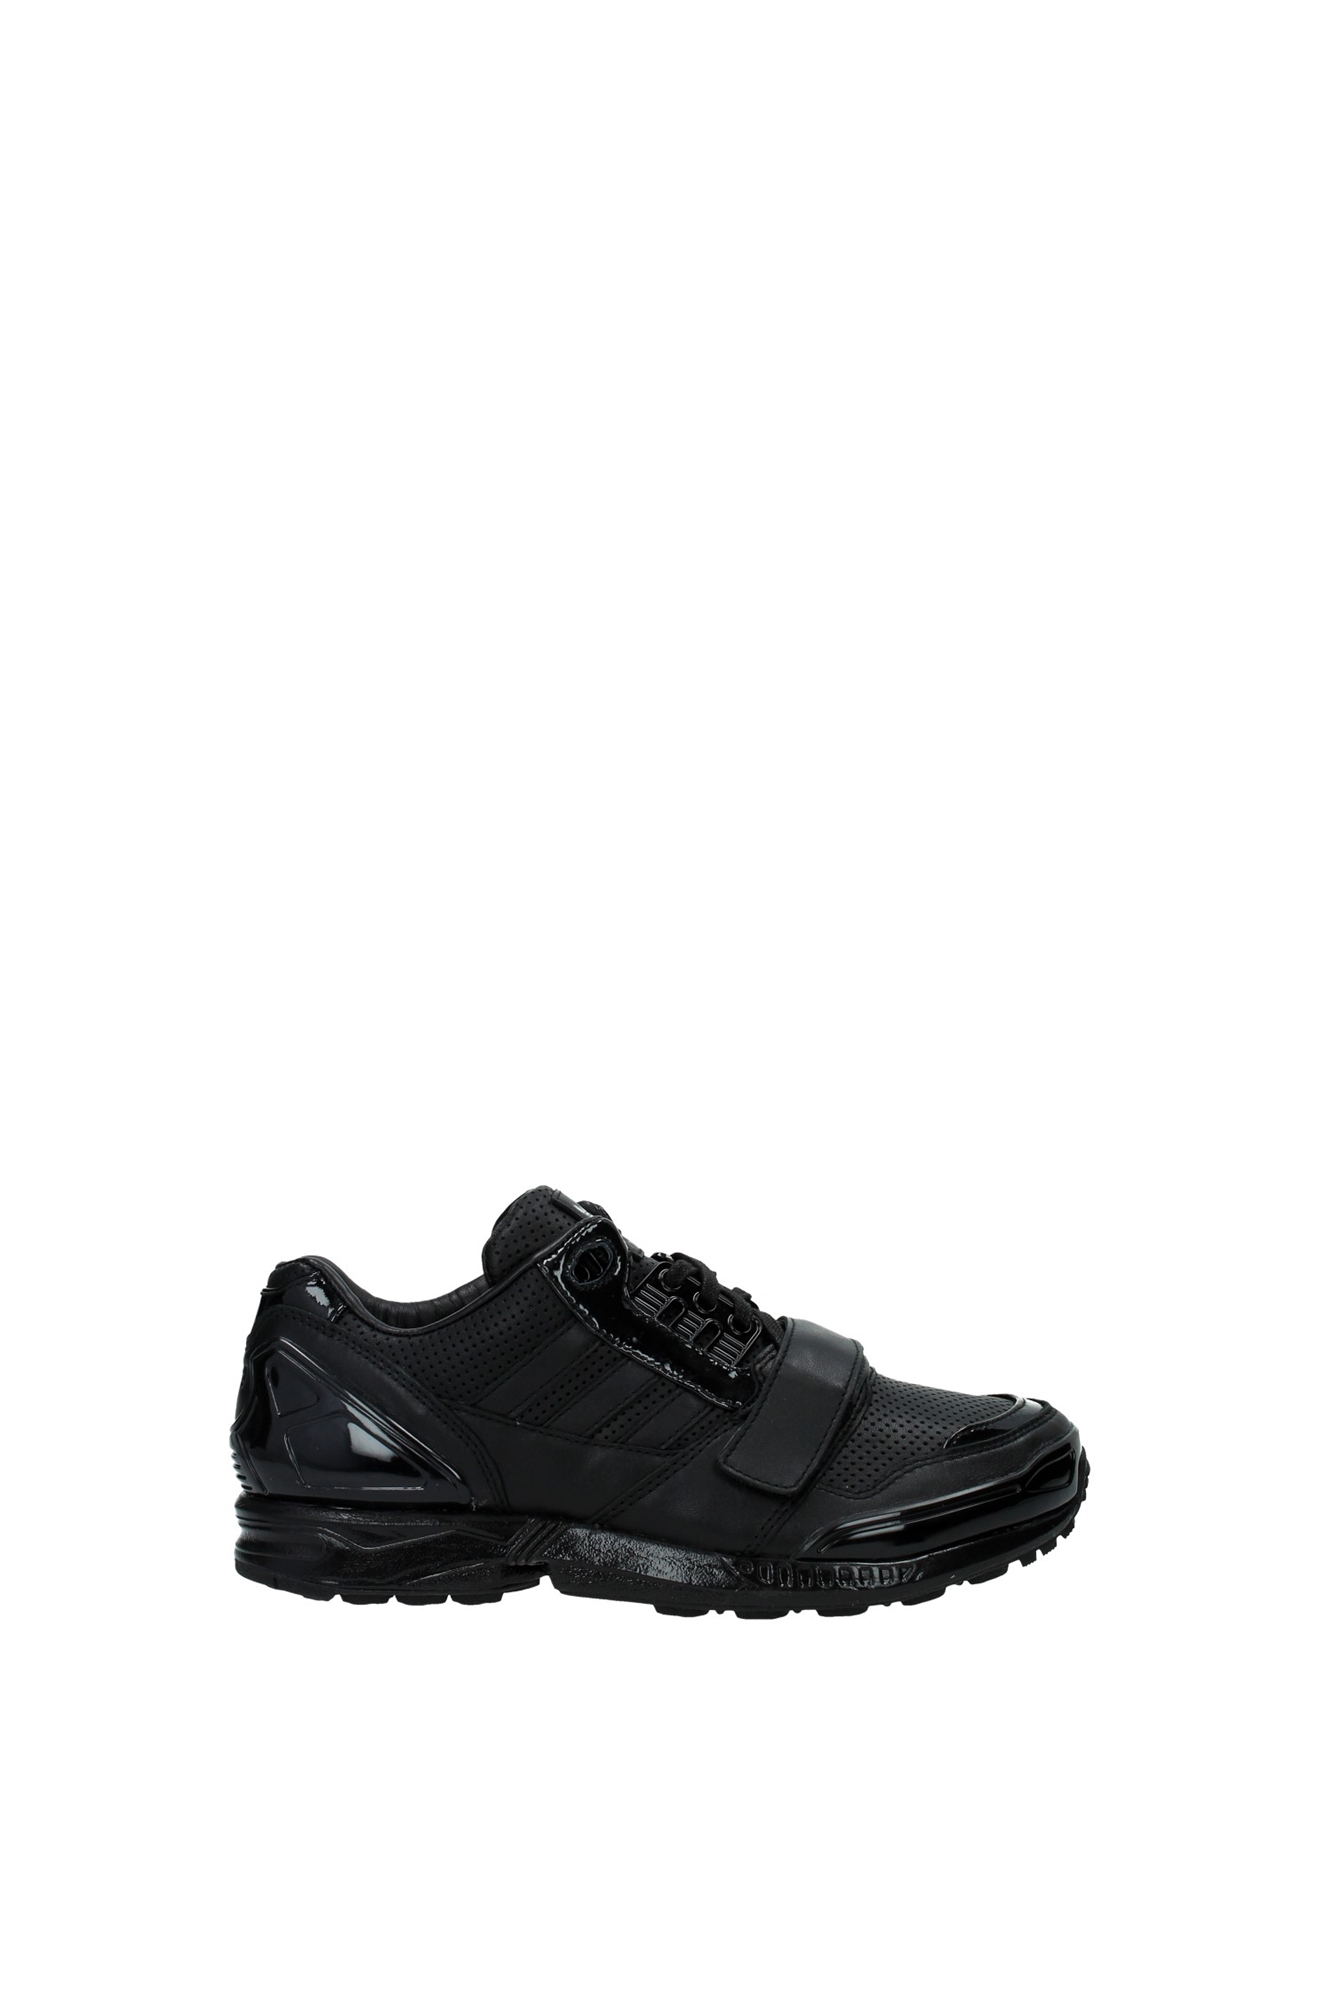 sneakers adidas herren leder schwarz aq4809zx8000lowjj ebay. Black Bedroom Furniture Sets. Home Design Ideas